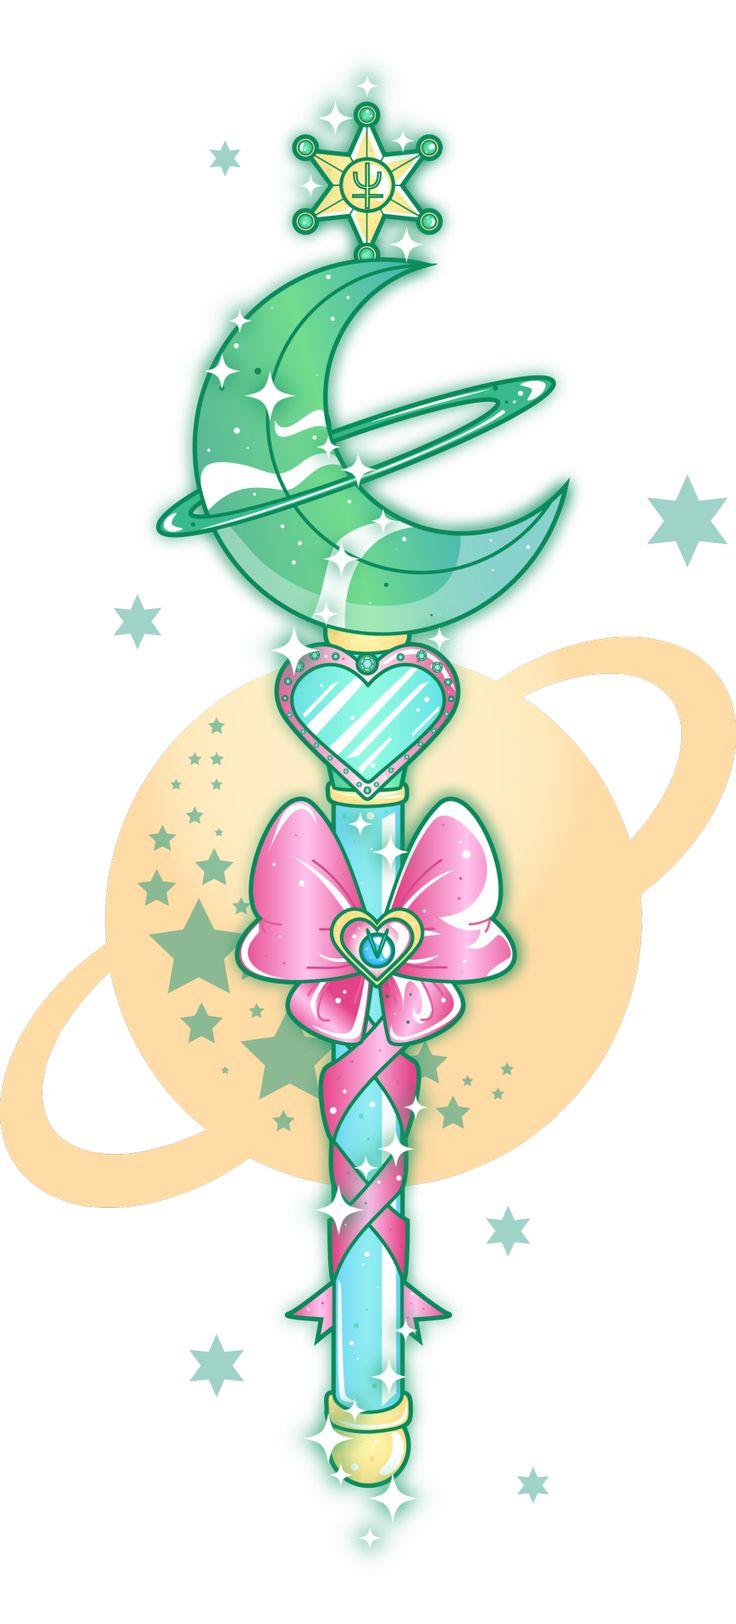 Sugarcoatedunicorns Sailor Neptune Wand With A Little